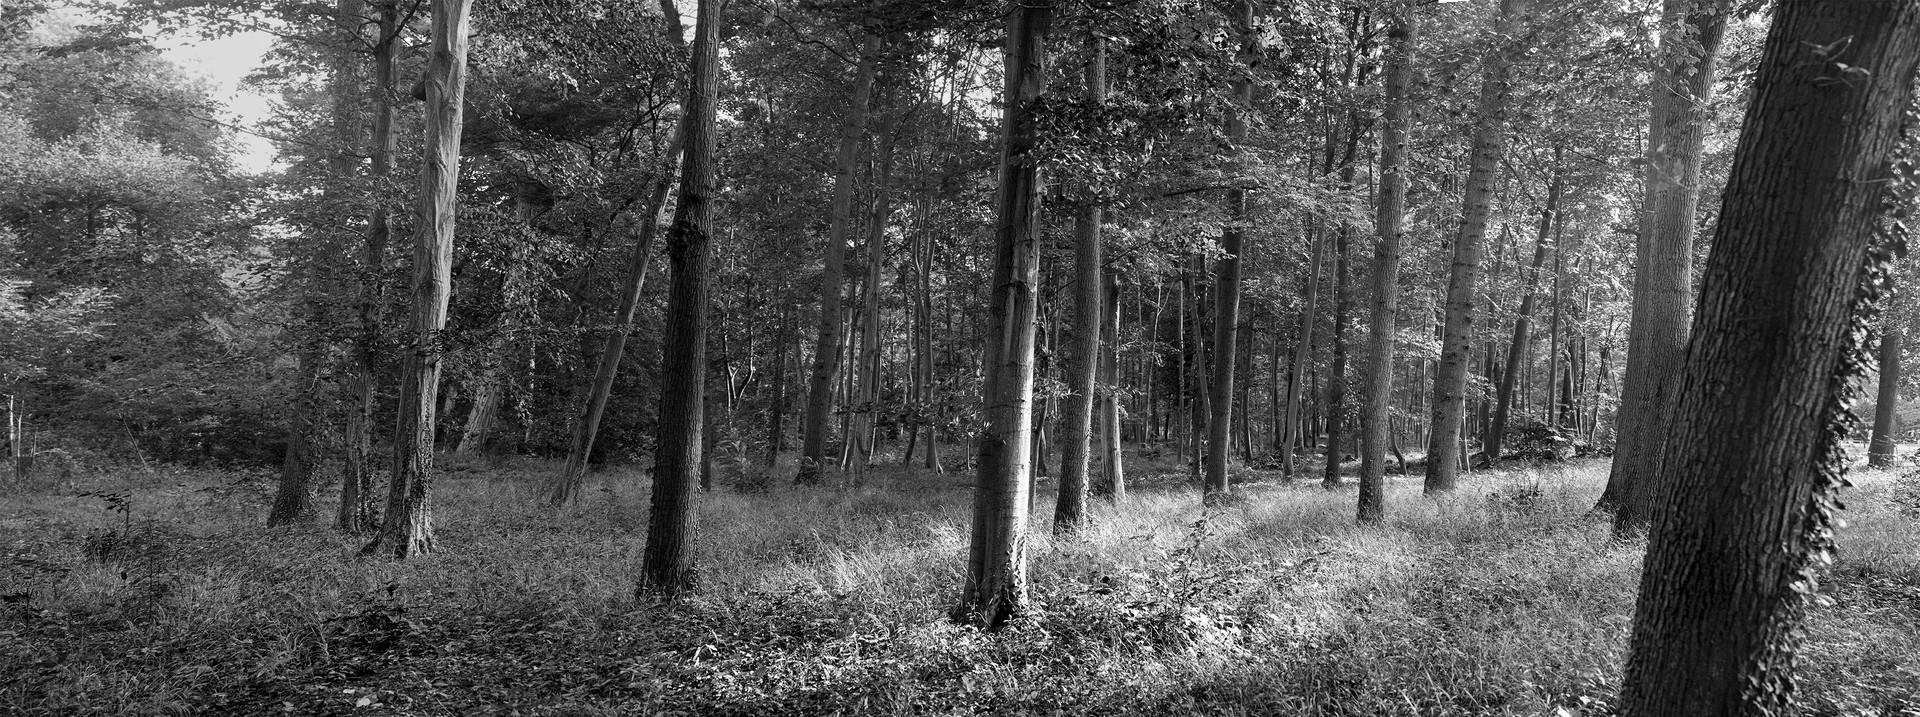 Untitled_Panorama81.jpg